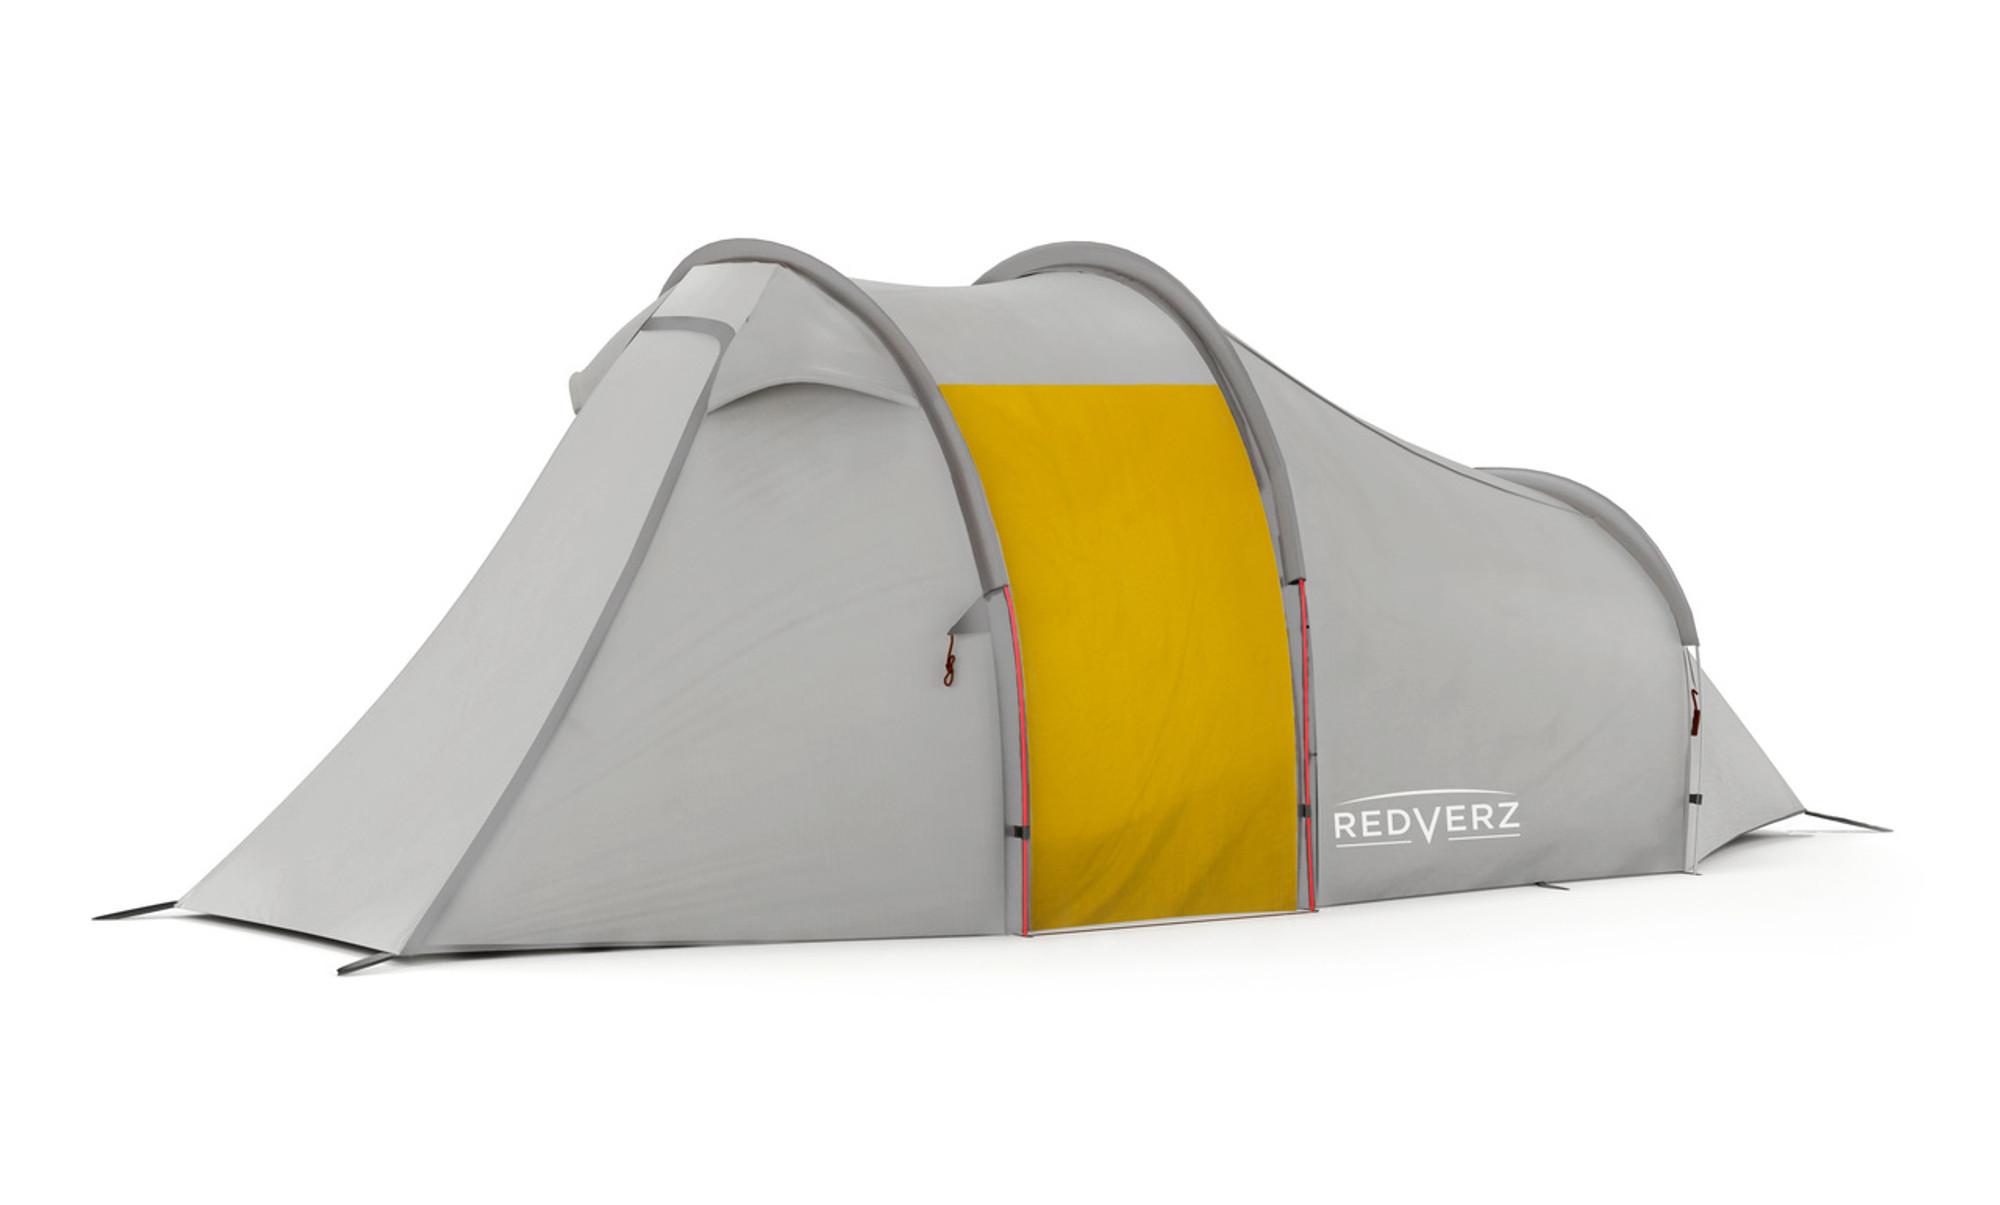 sc 1 st  Redverz Gear & Redverz Gear - Atacama Motorcycle Tents Grey/Yellow